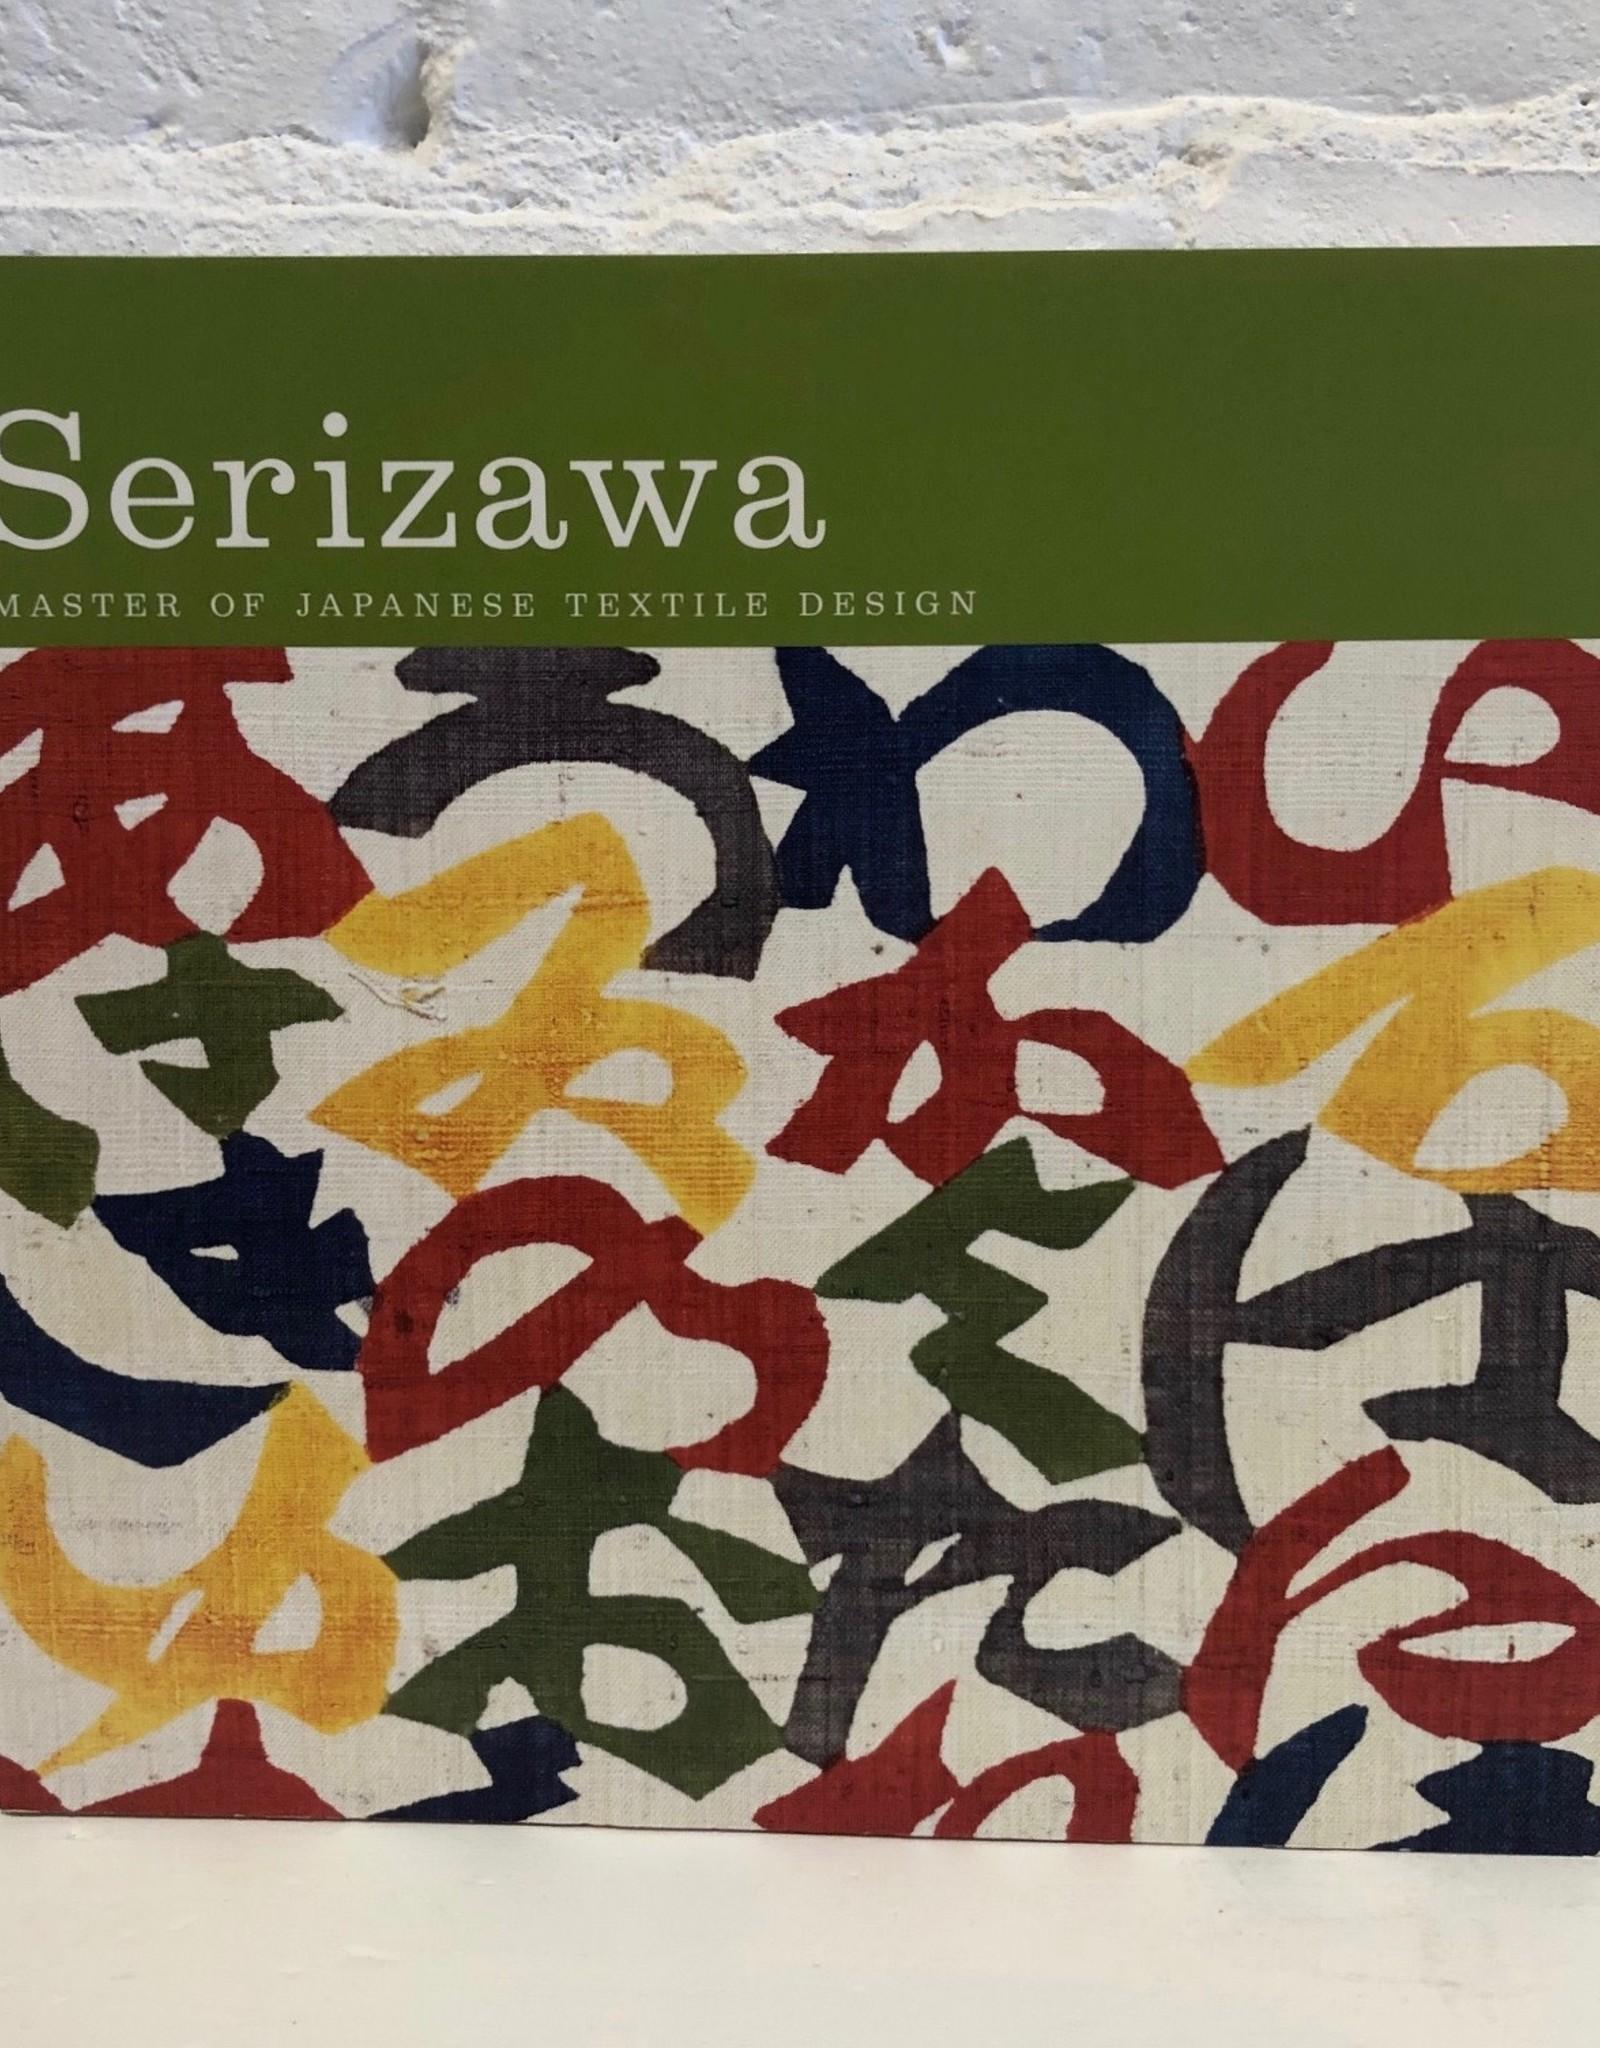 Serizawa: Master of Japanese Textile Design